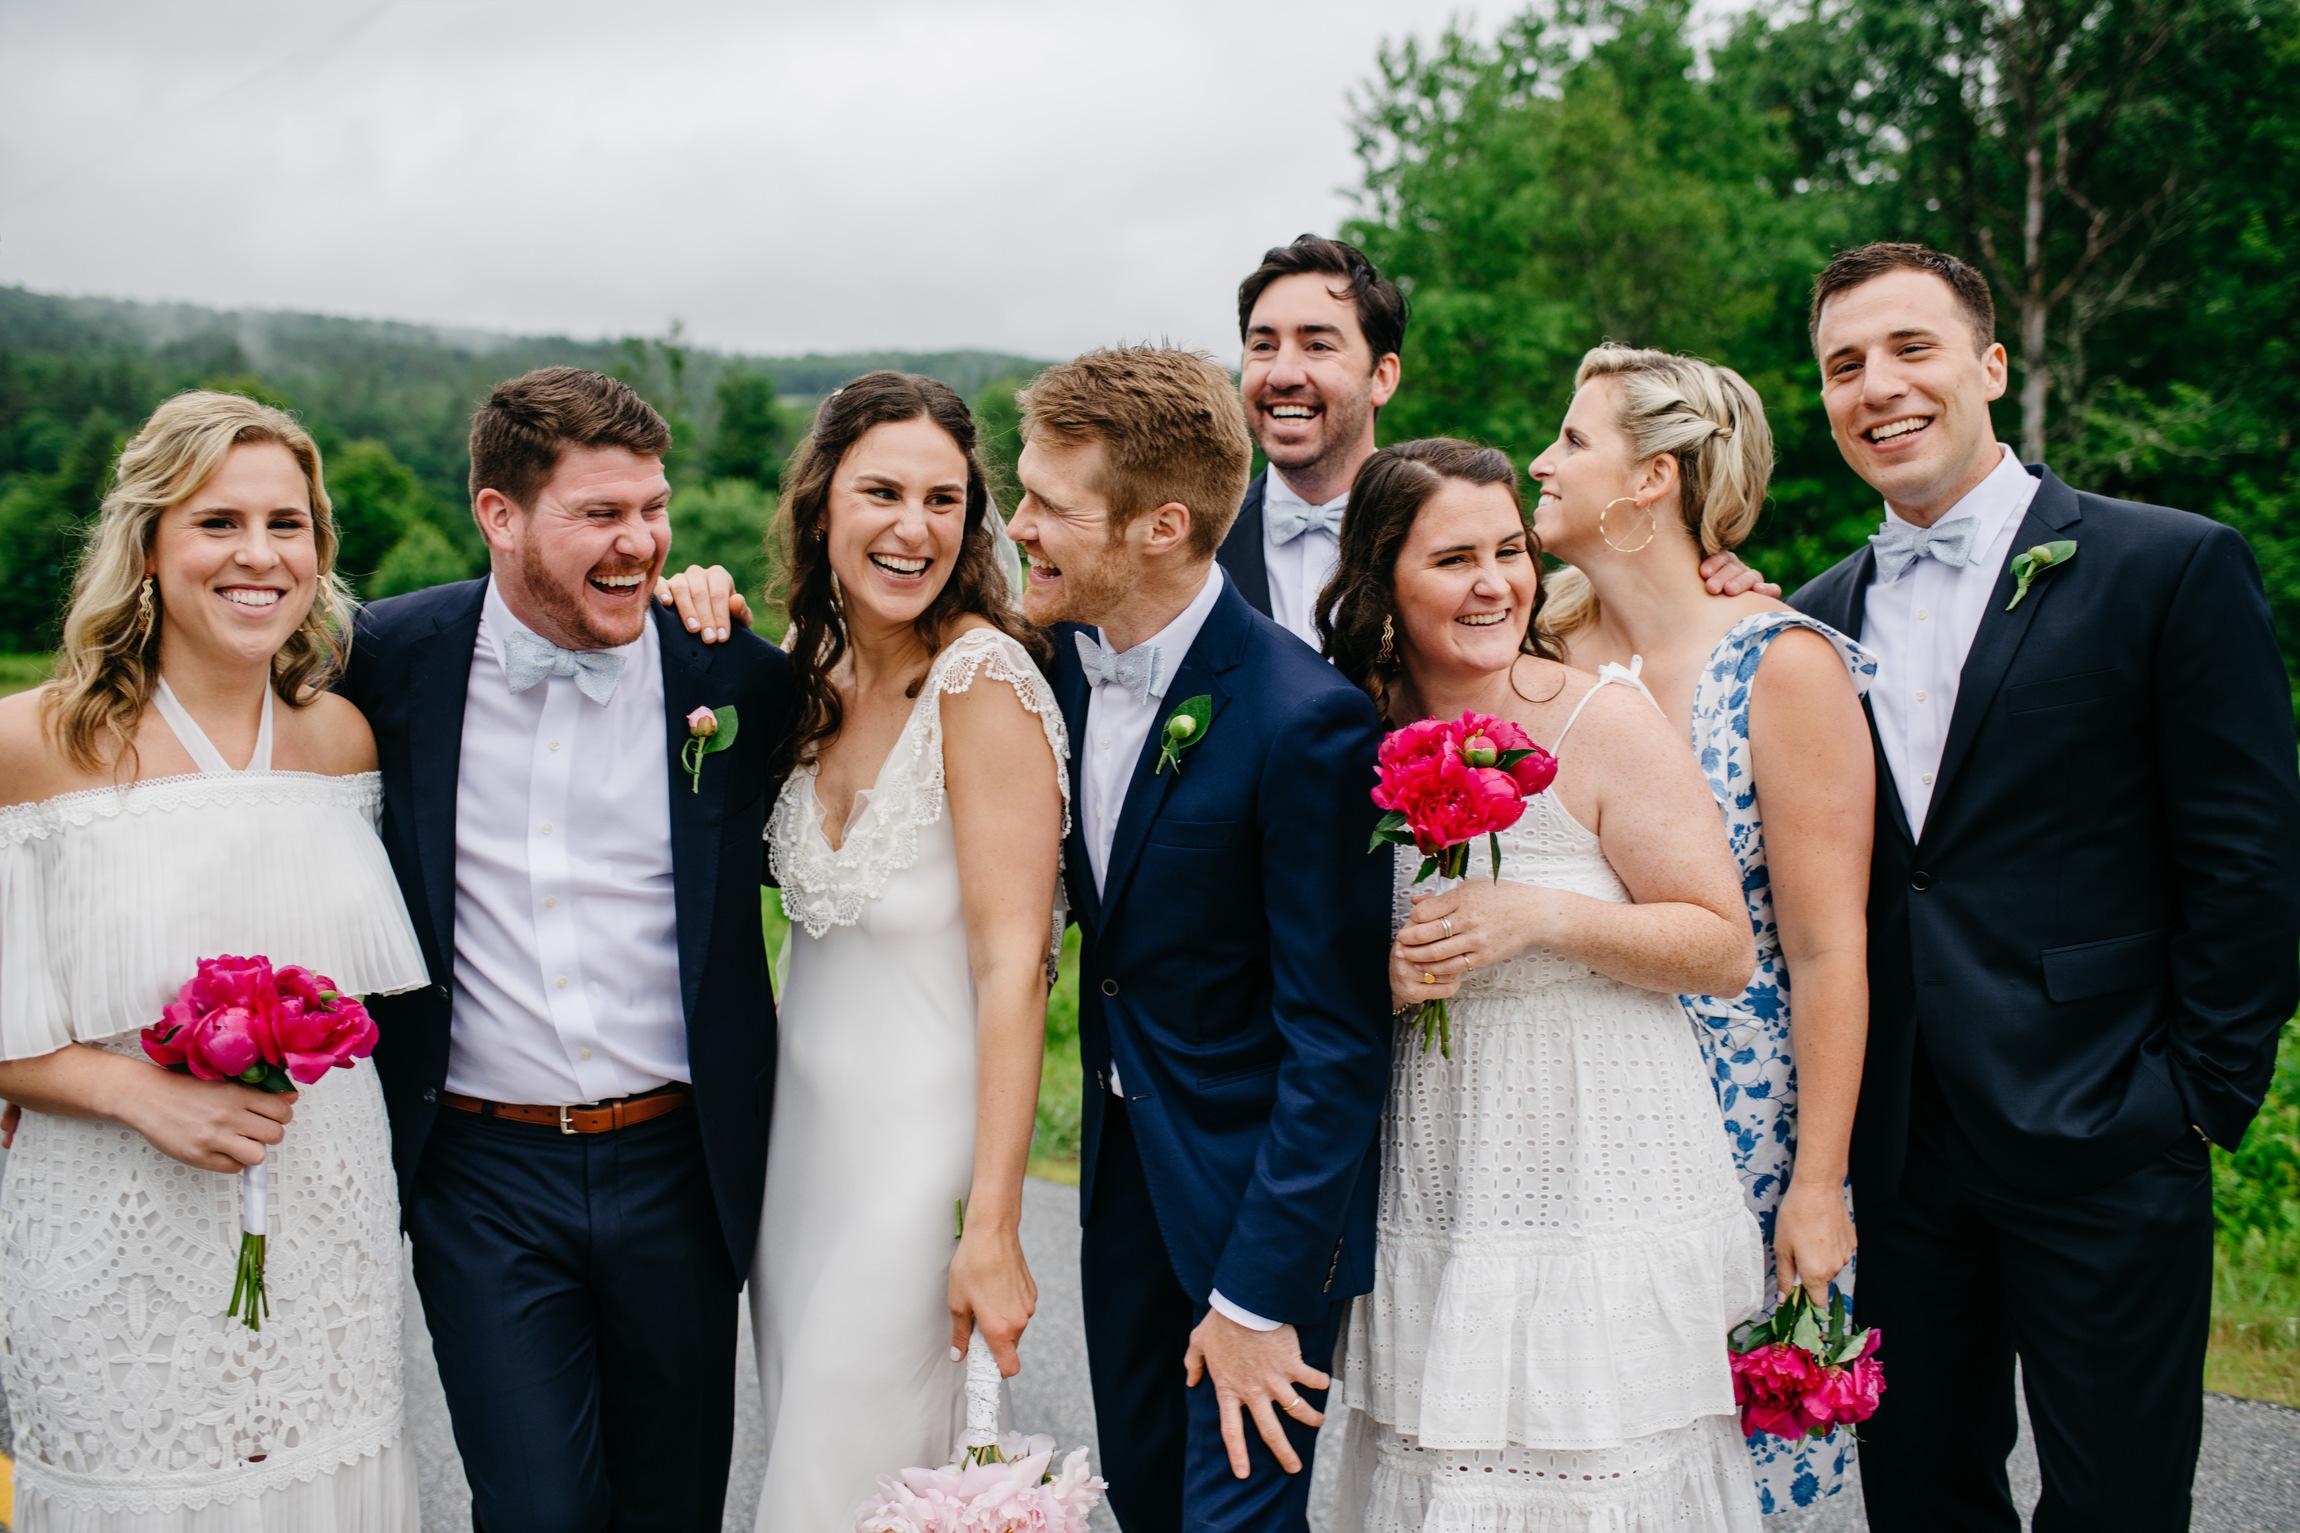 brooklyn weddings and vermont wedding planning